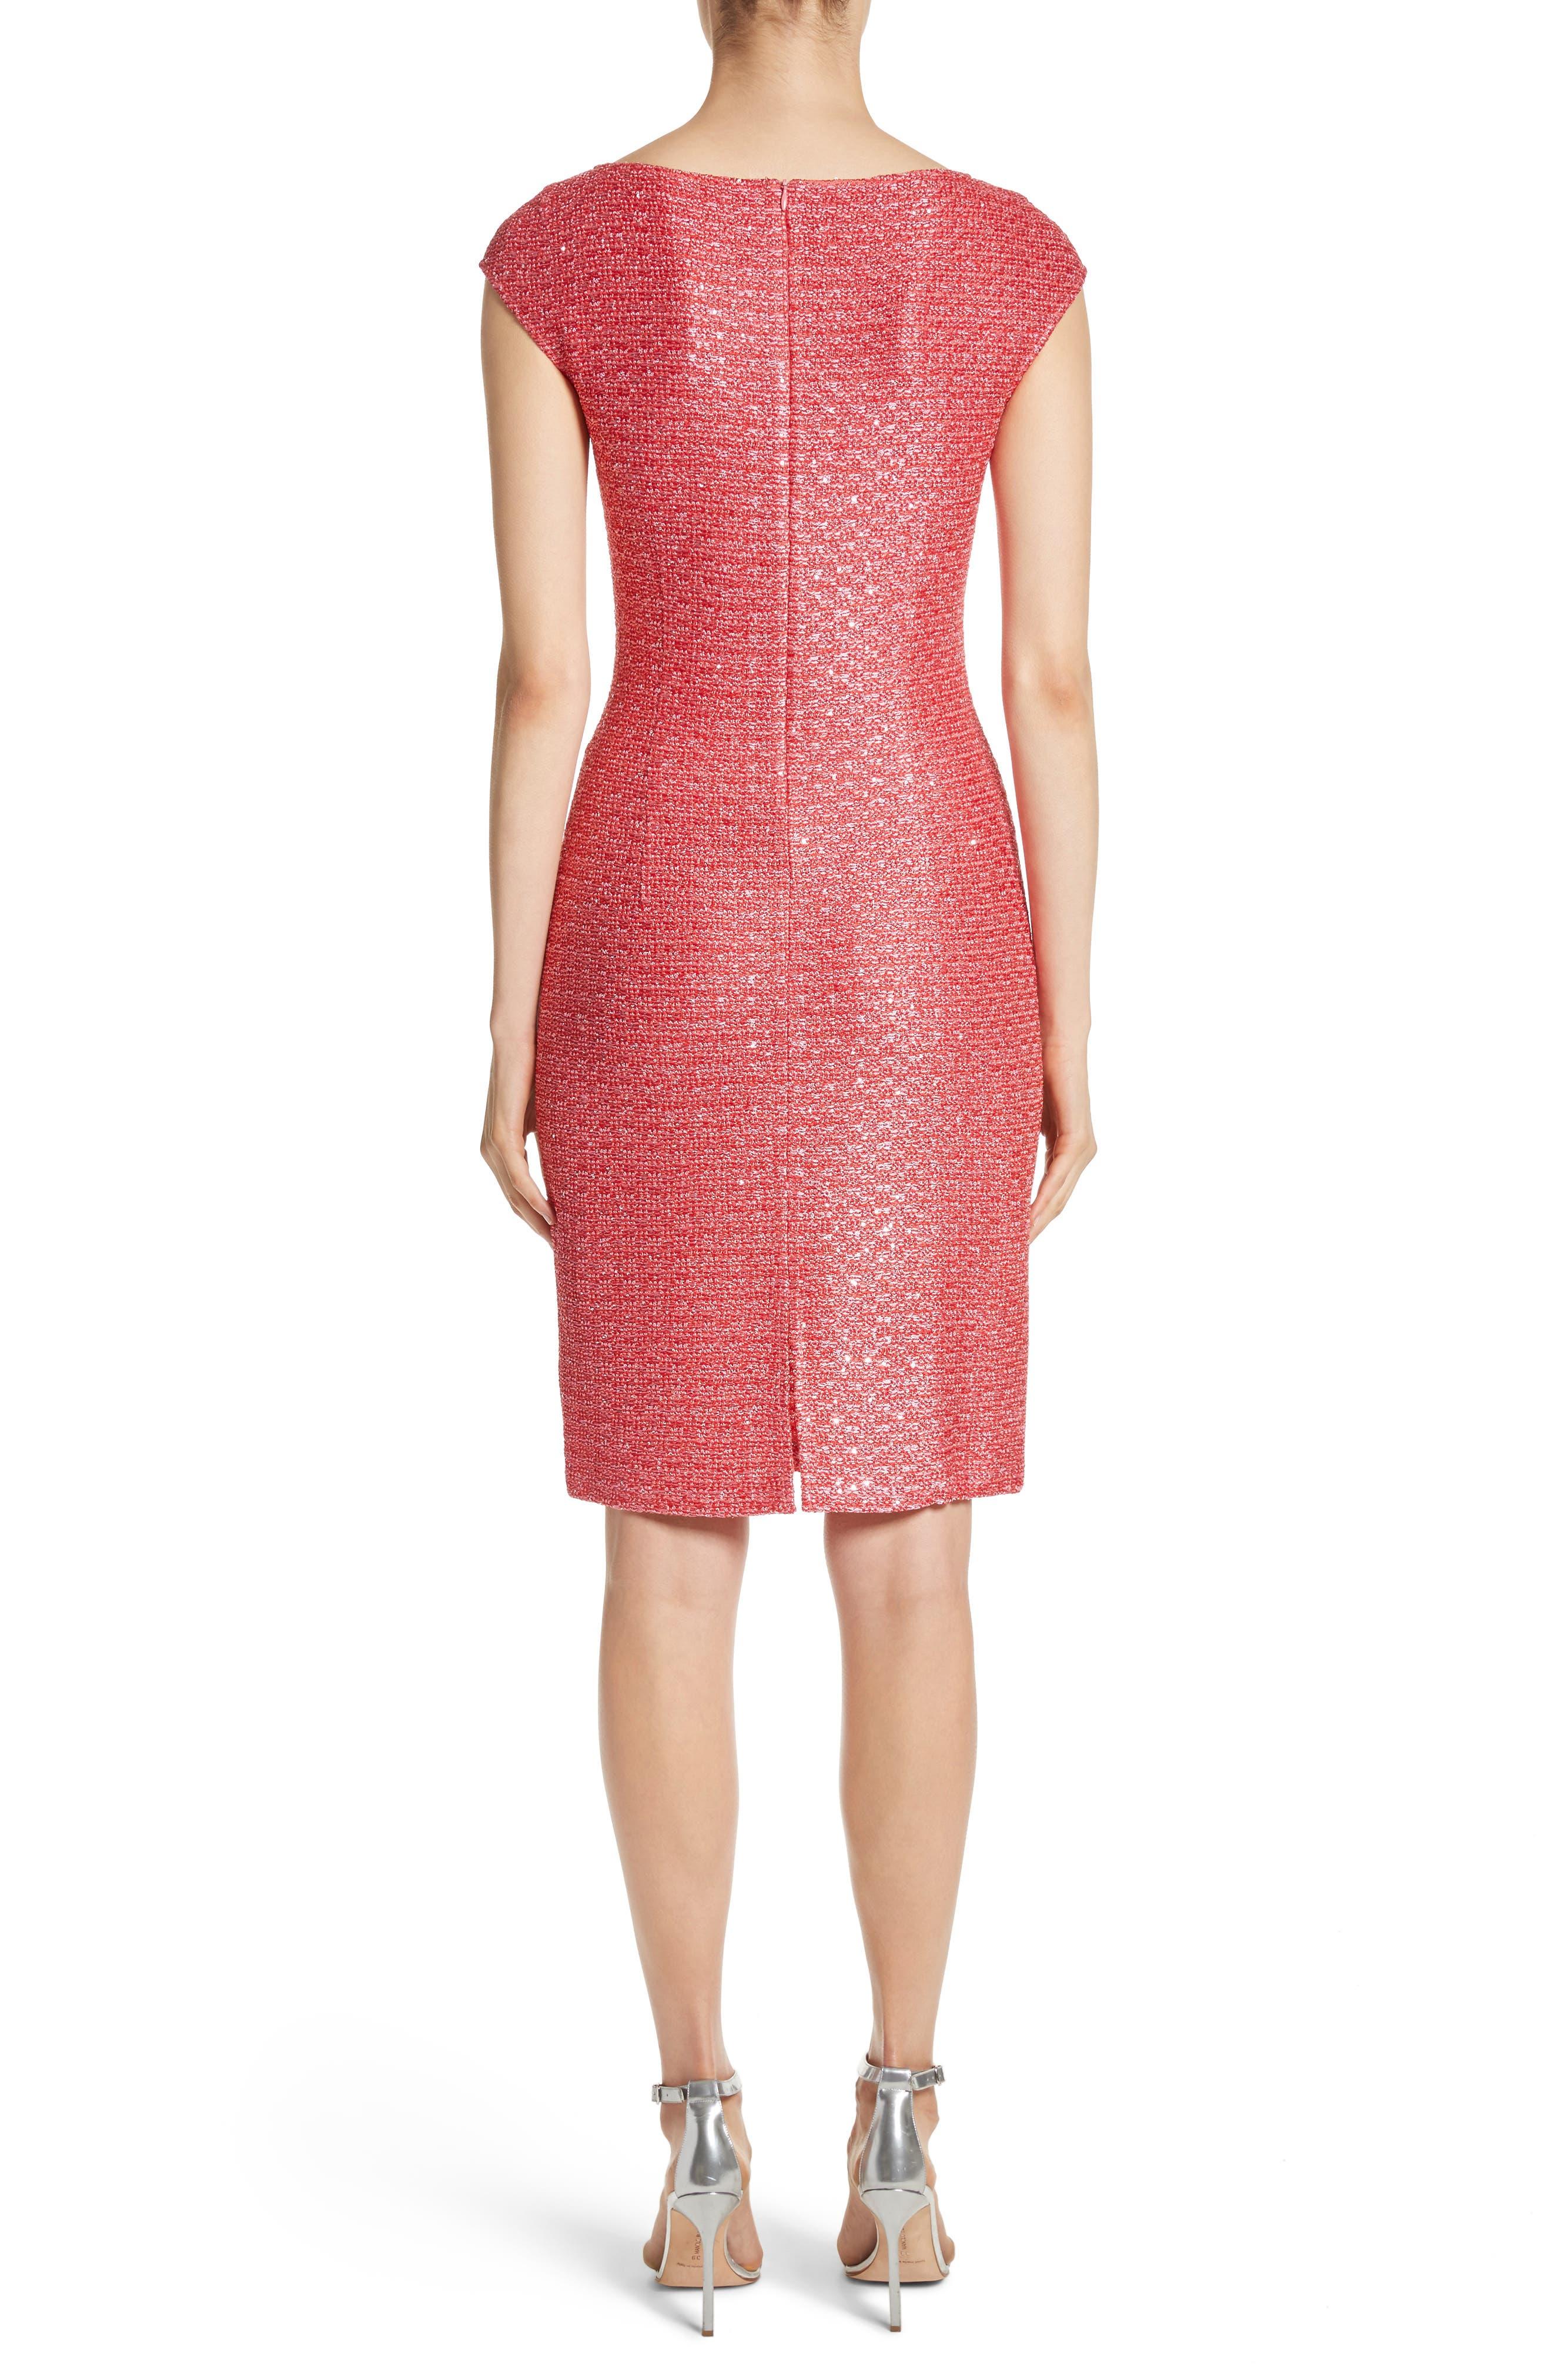 Hansh Knit Dress,                             Alternate thumbnail 2, color,                             Coral Multi